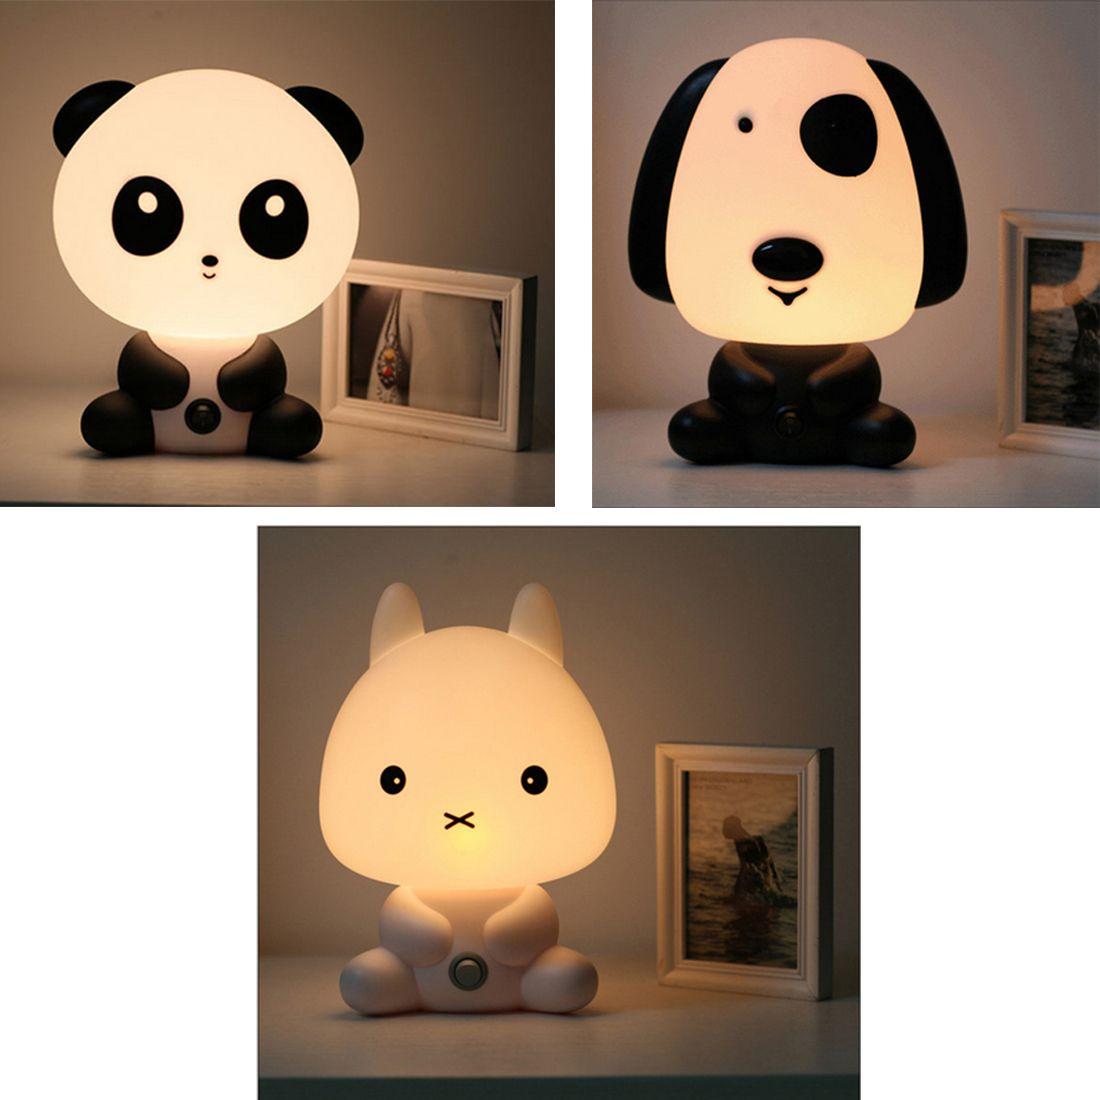 New EU Plug Baby Bedroom Lamps Night Light Cartoon Pets Rabbit Panda PVC Plastic Sleep Led Kid Lamp Bulb Nightlight for Children